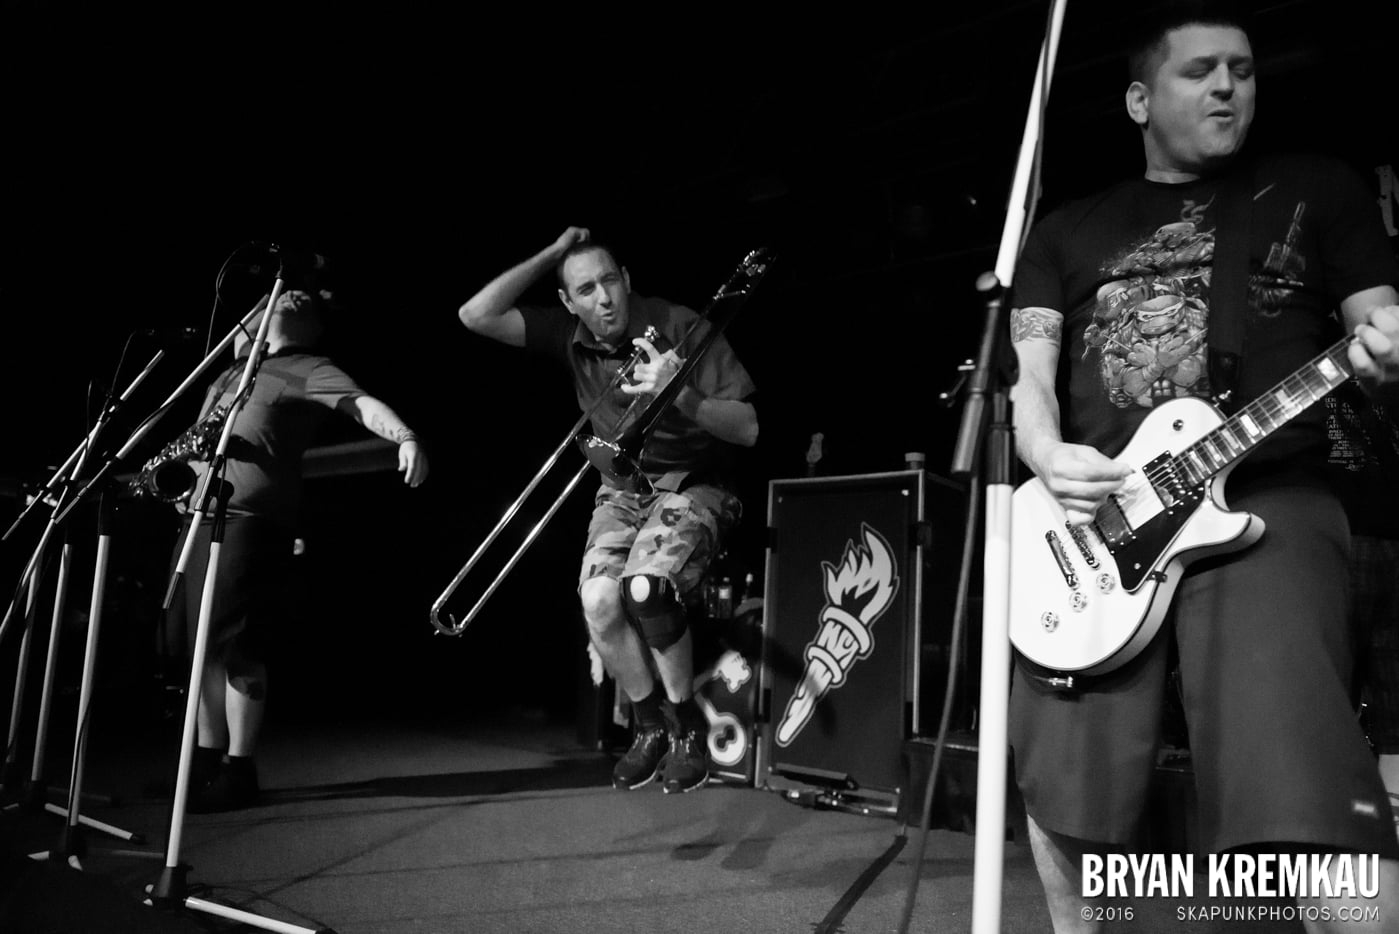 Less Than Jake @ Starland Ballroom, Sayreville, NJ - 11.9.13 (23)